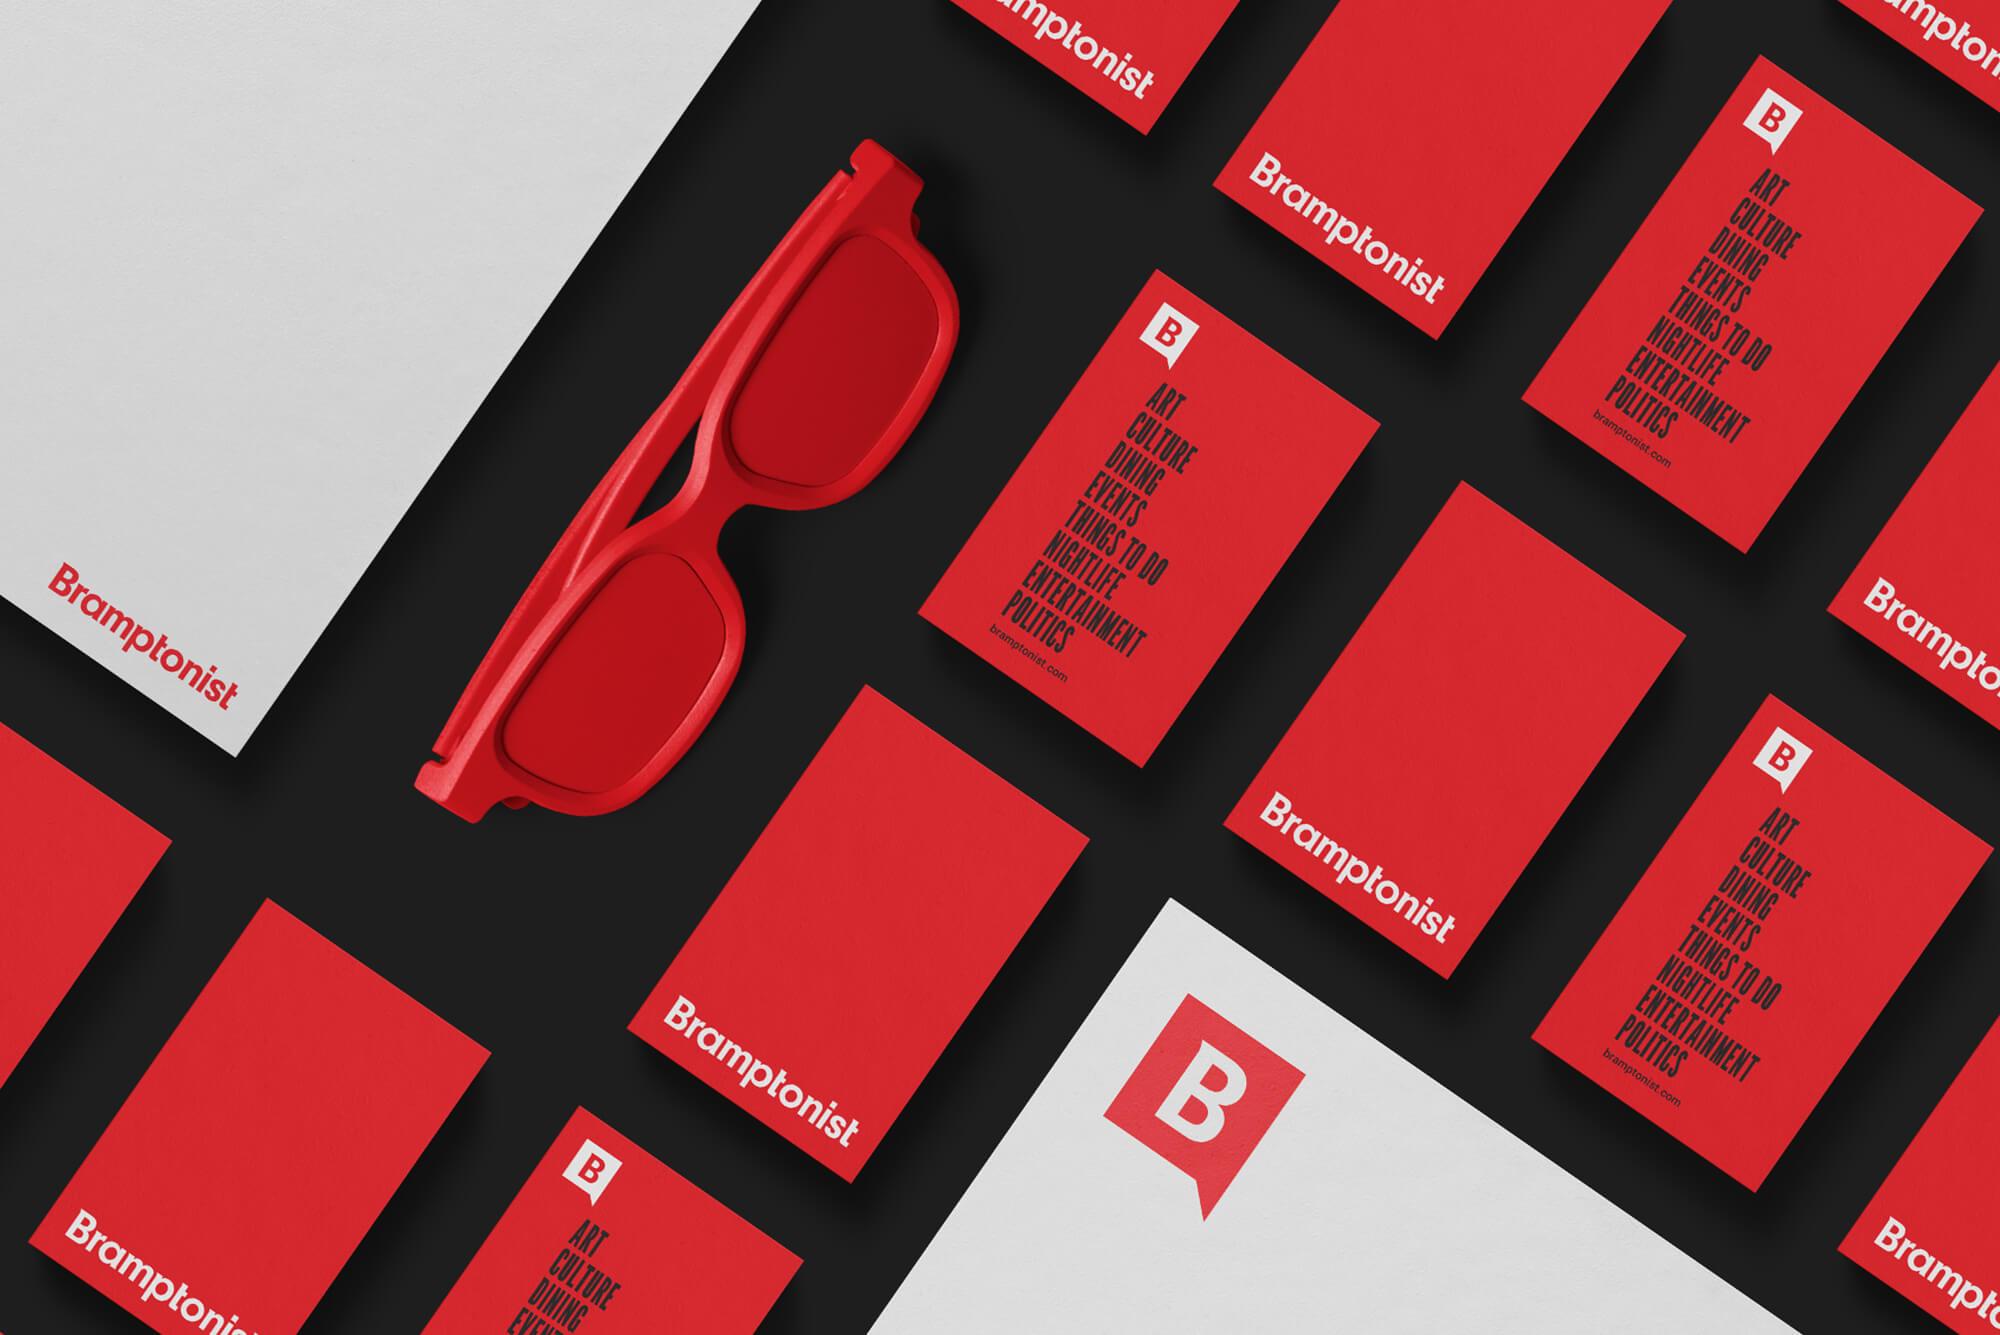 Bramptonist-branding-4